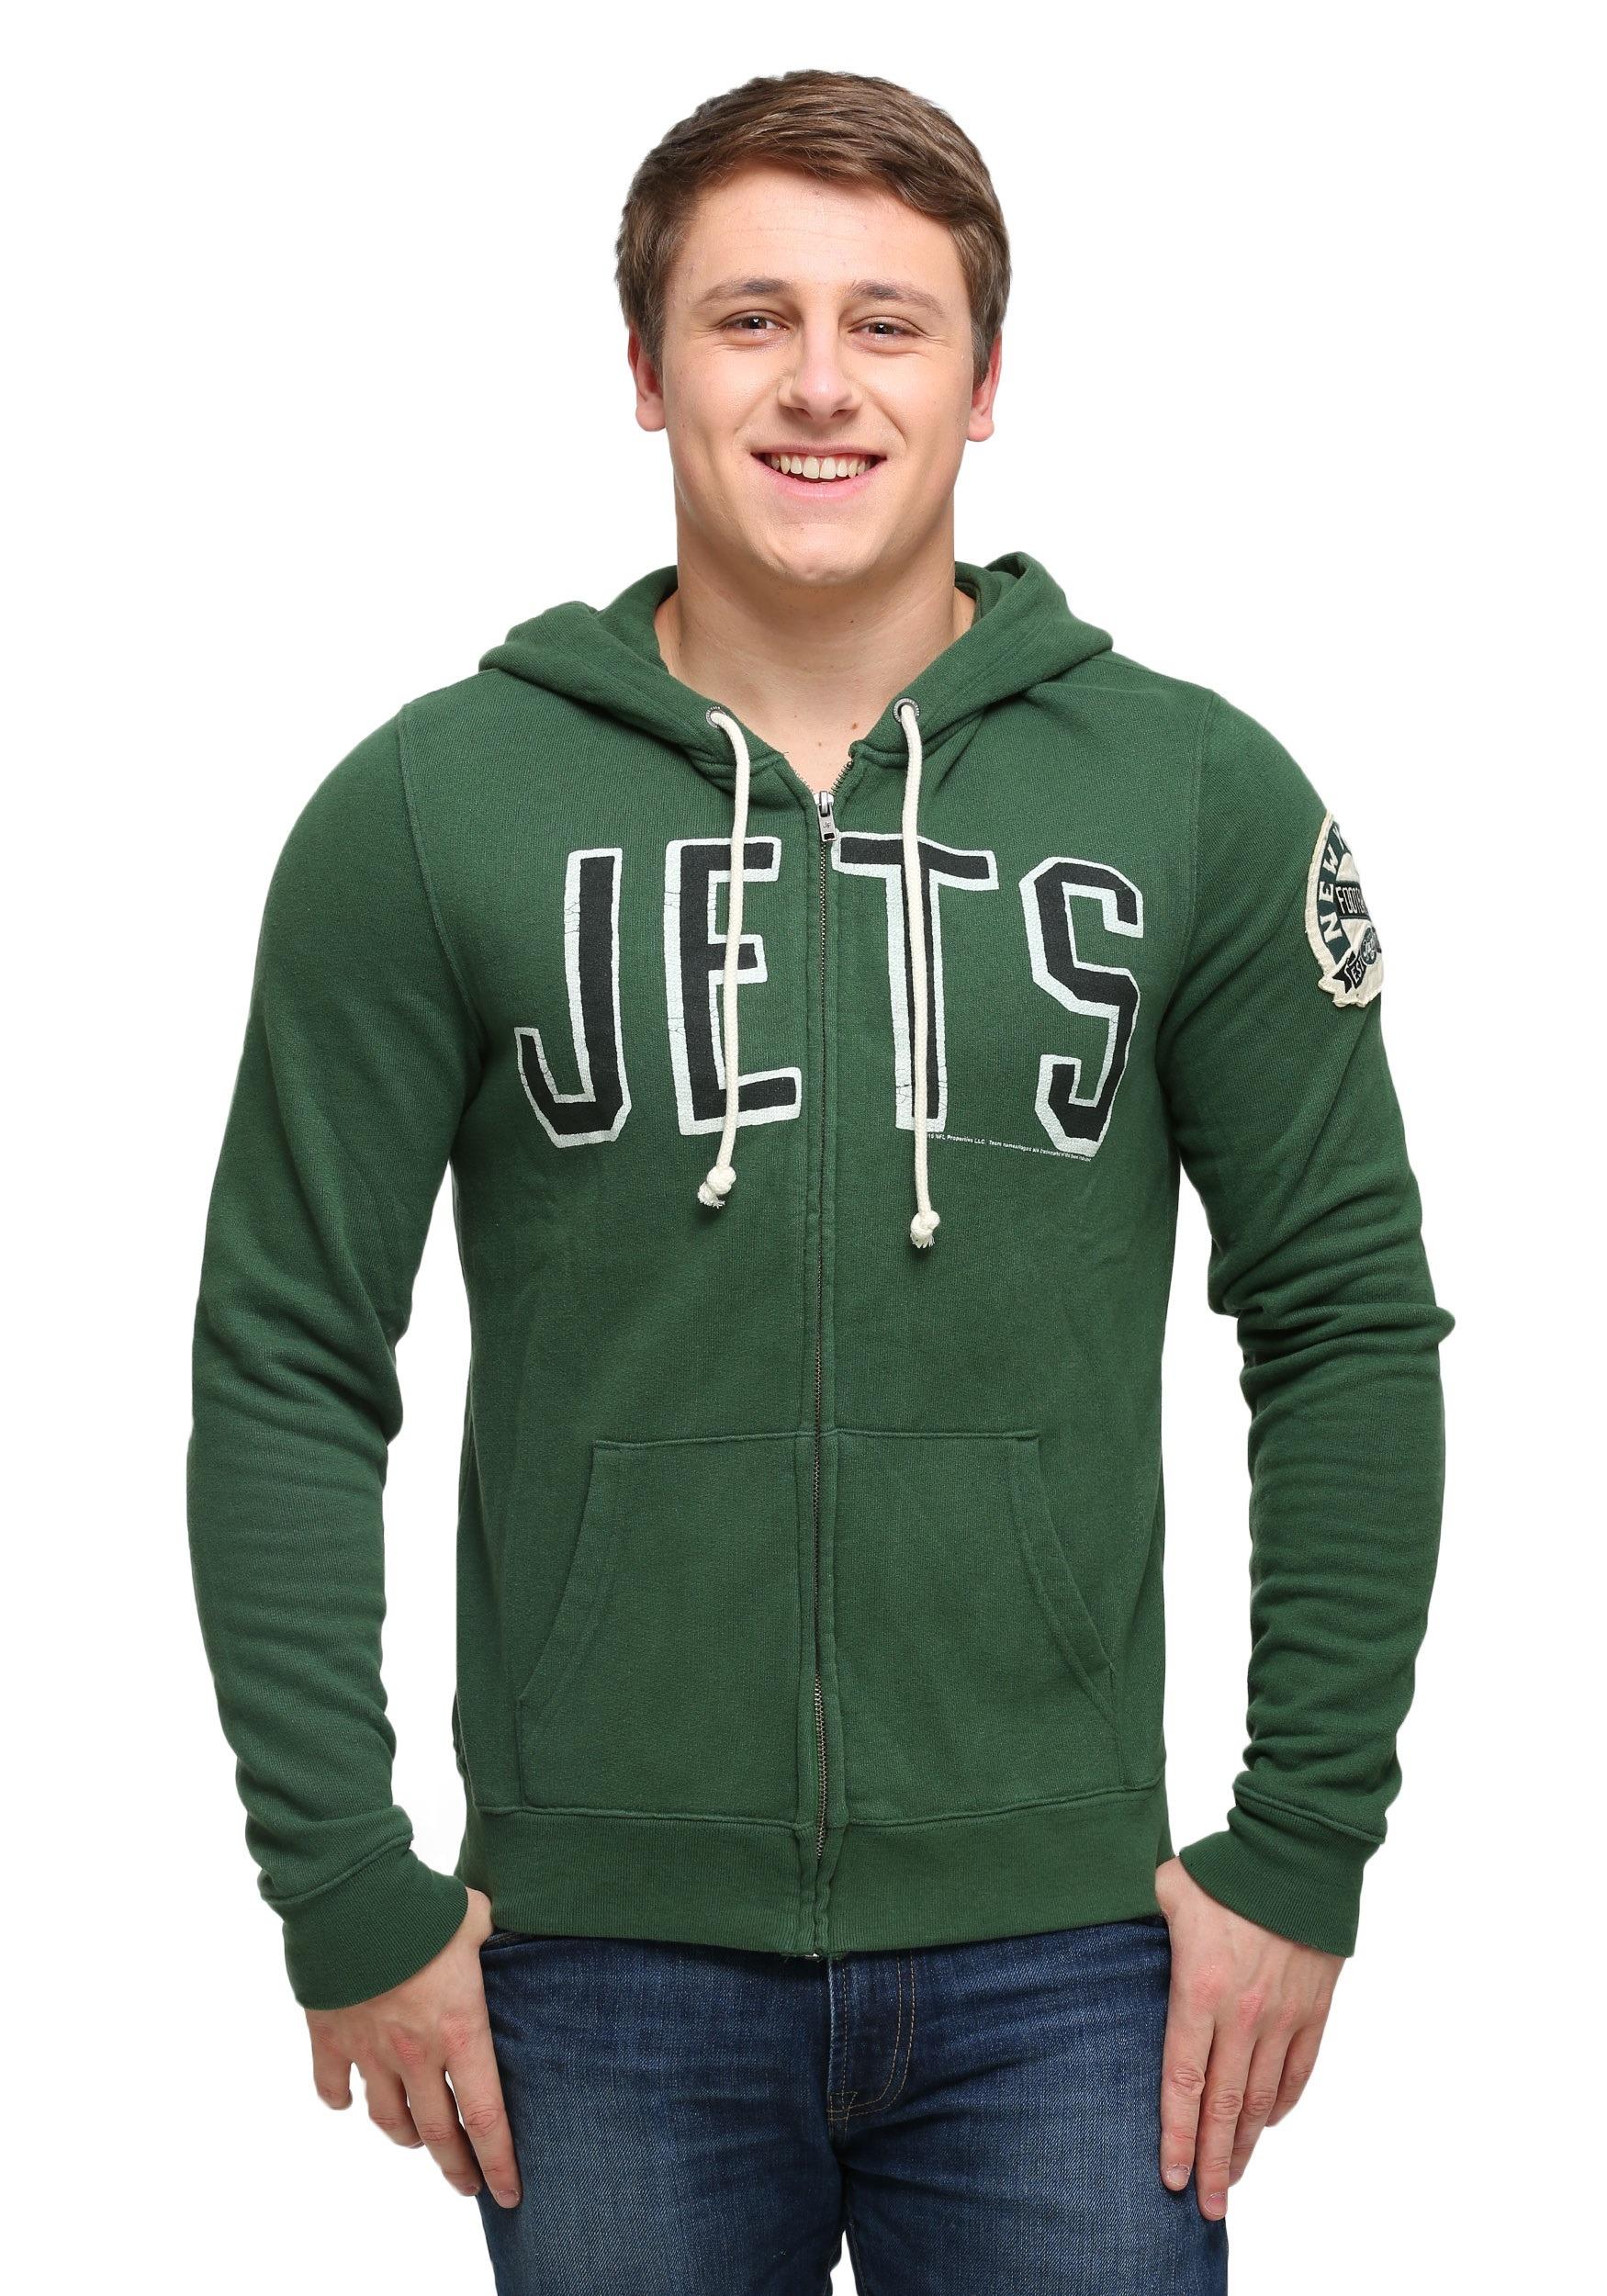 lowest price 66103 253ac New York Jets Sunday Mens Zip Up Hoodie